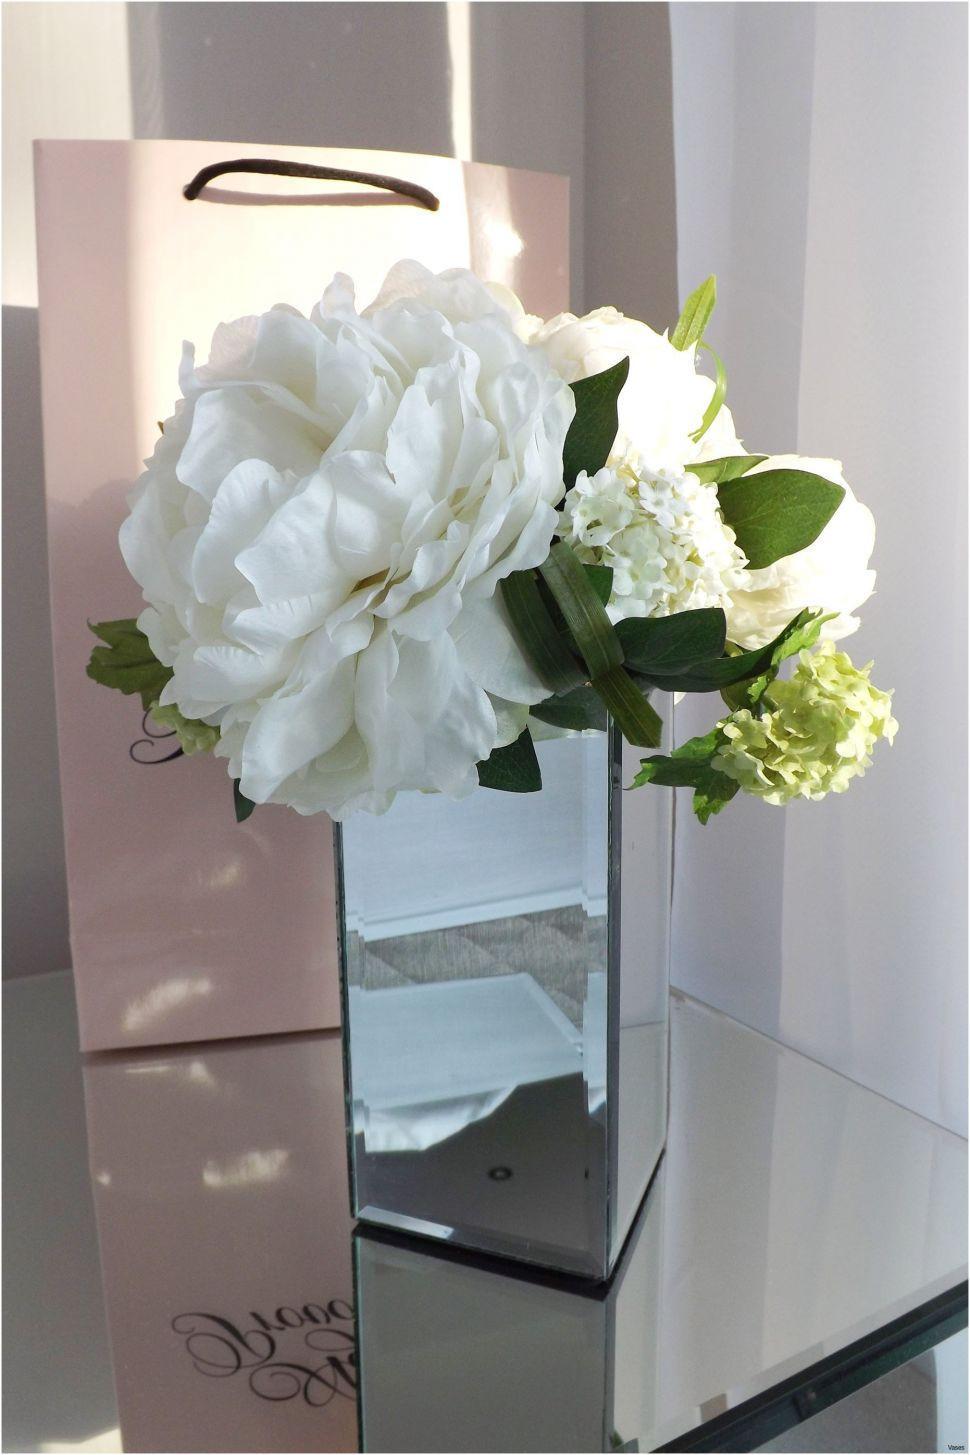 big vase floral arrangements of download new silk arrangements for home decor with regard to silk arrangements for home decor fresh silk flowers metal vases 3h mirrored mosaic vase votivei 0d